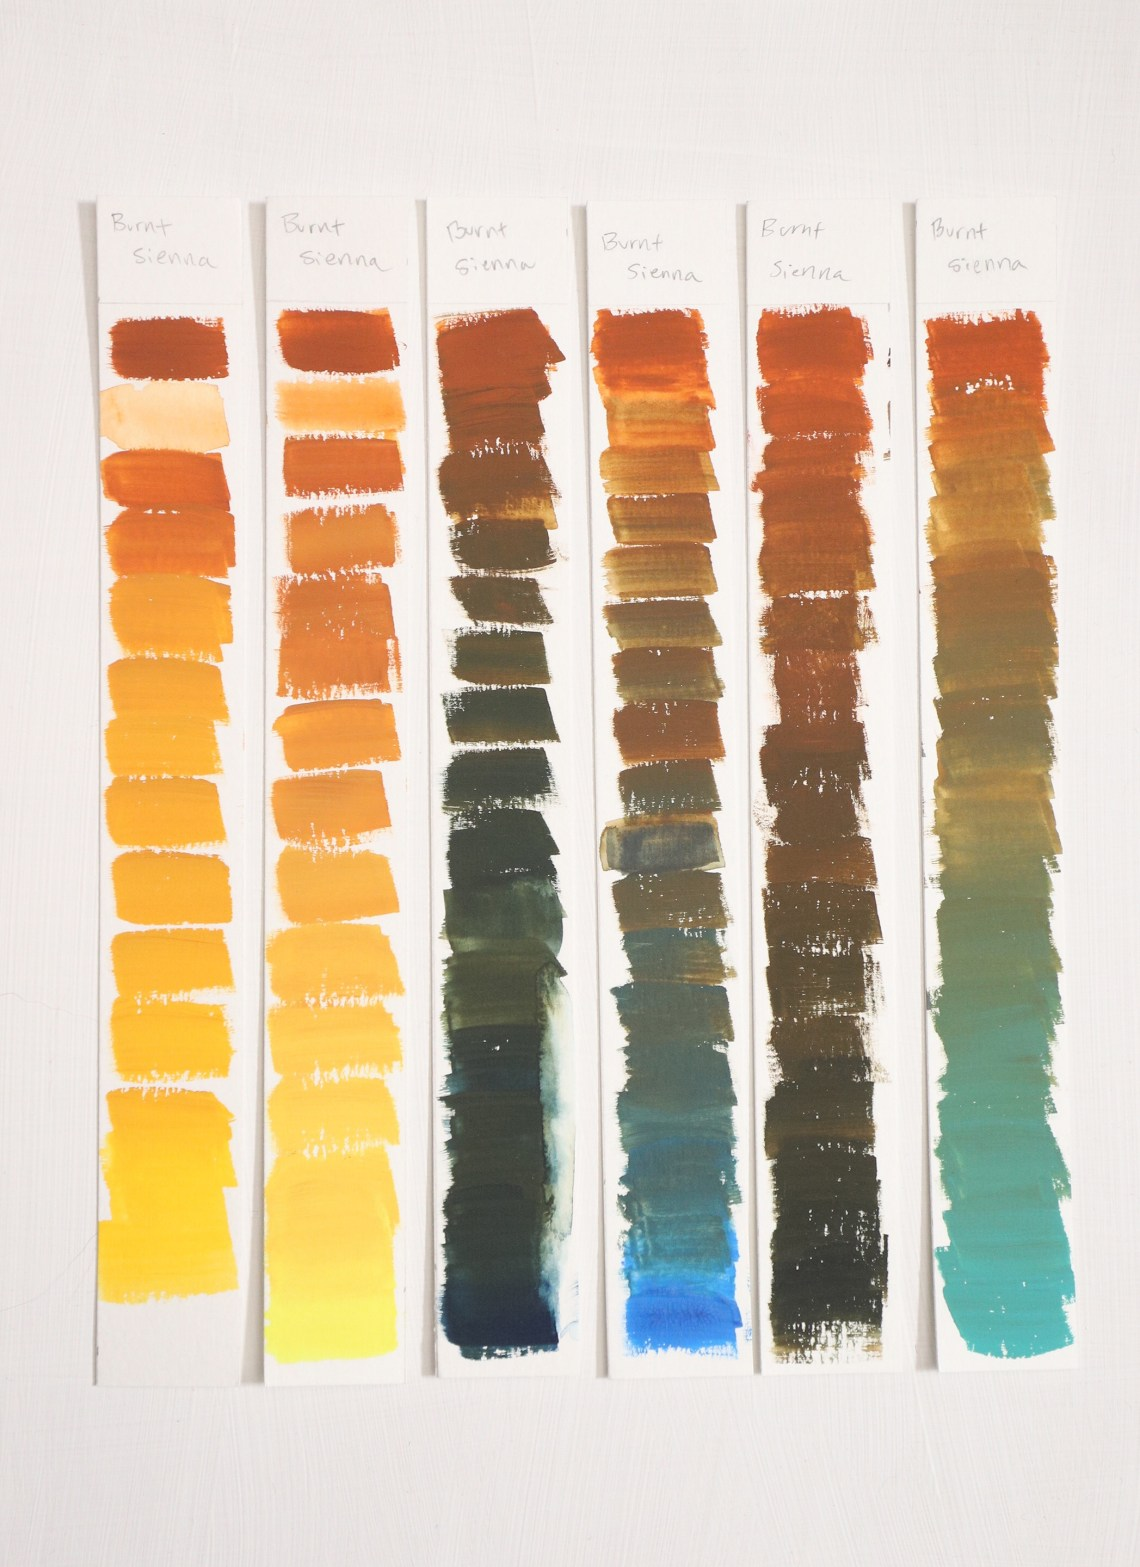 Burnt Sienna Gouache mixing chart